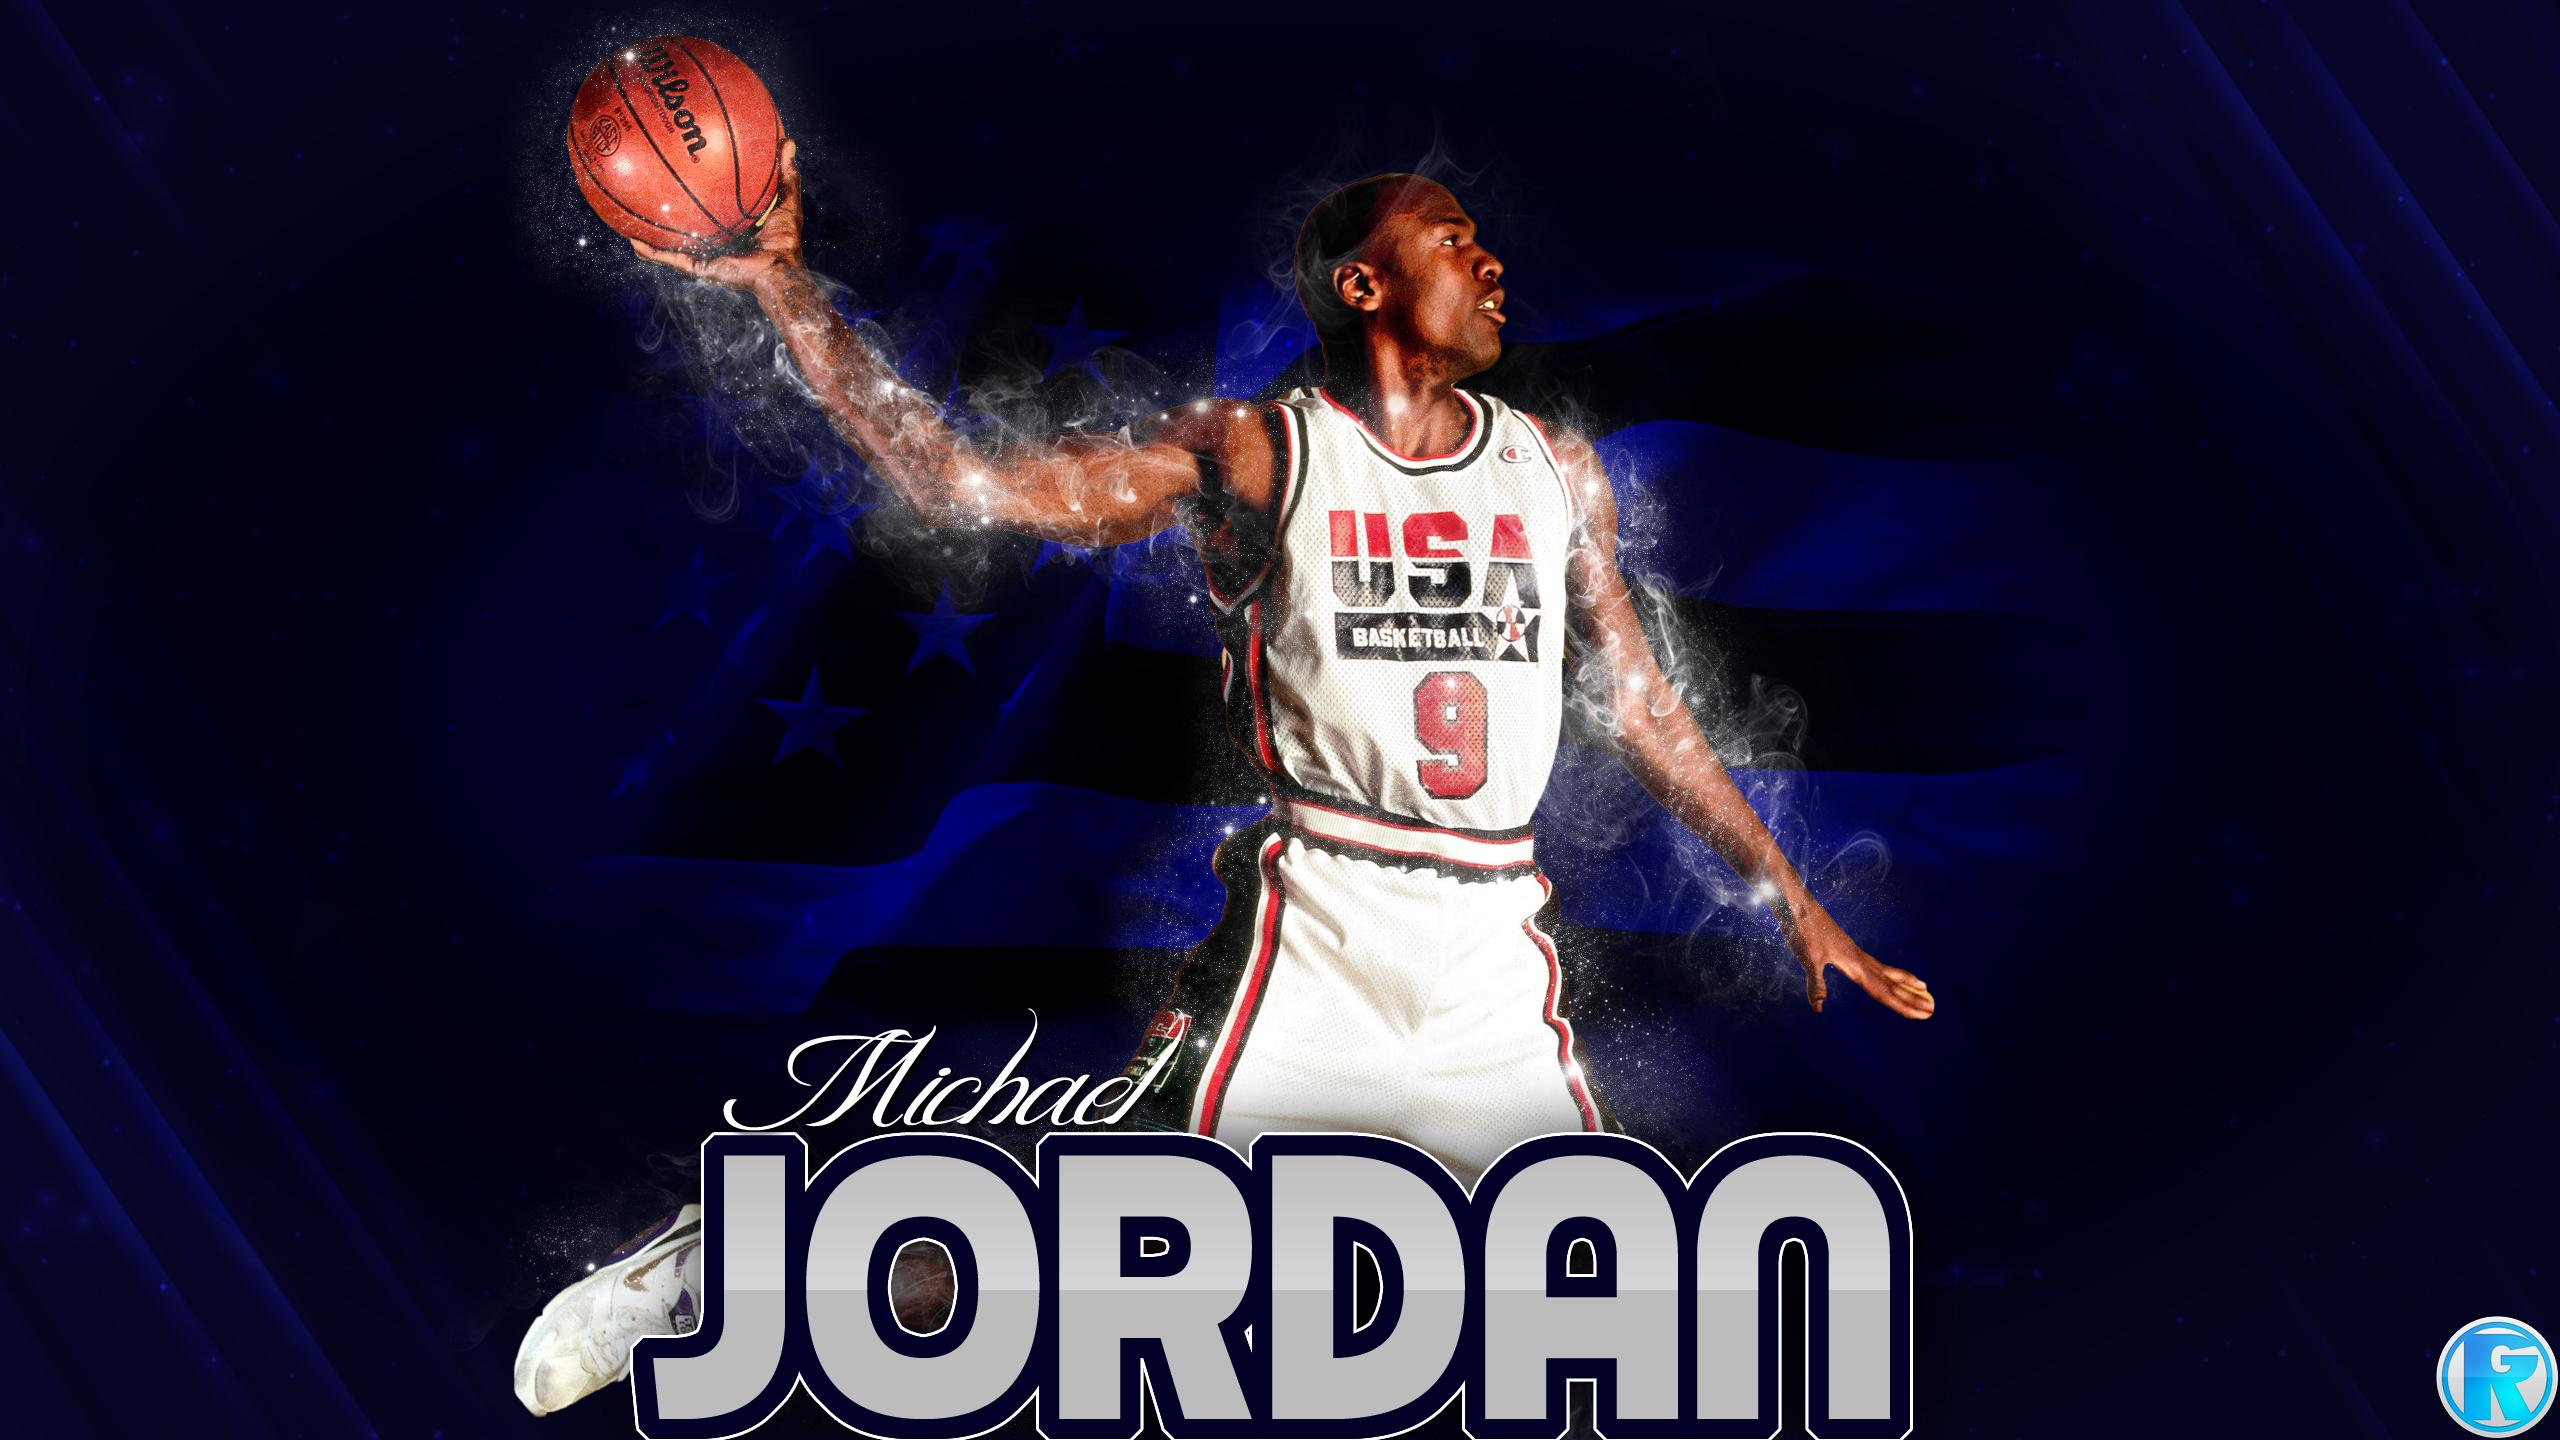 Jordan IPhone Wallpaper HD